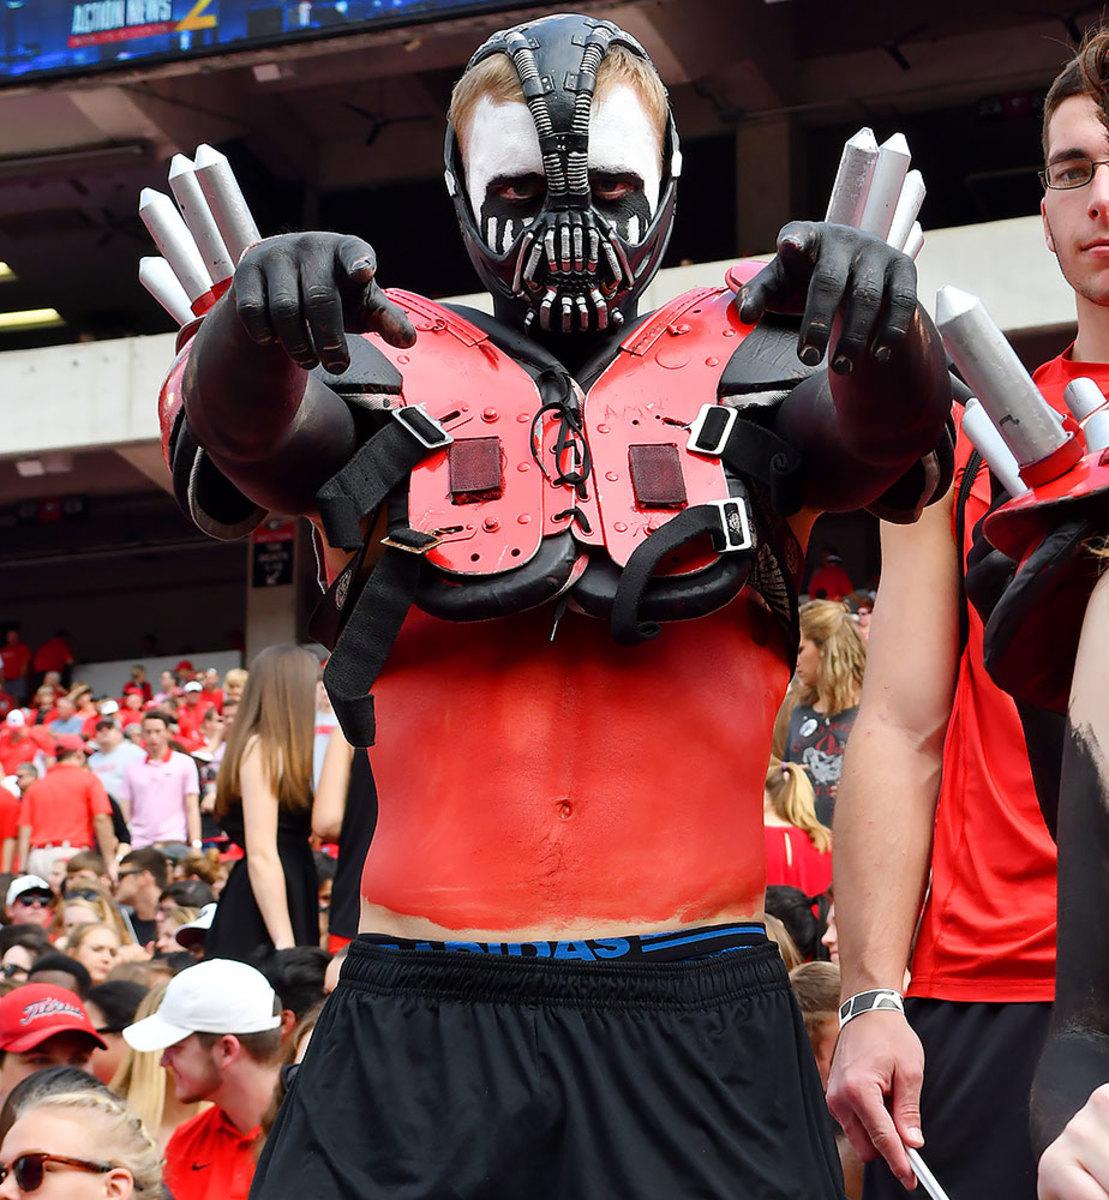 2016-1015-Georgia-Bulldogs-fans-ccr161015014_Vanderbilt_at_Georgia.jpg